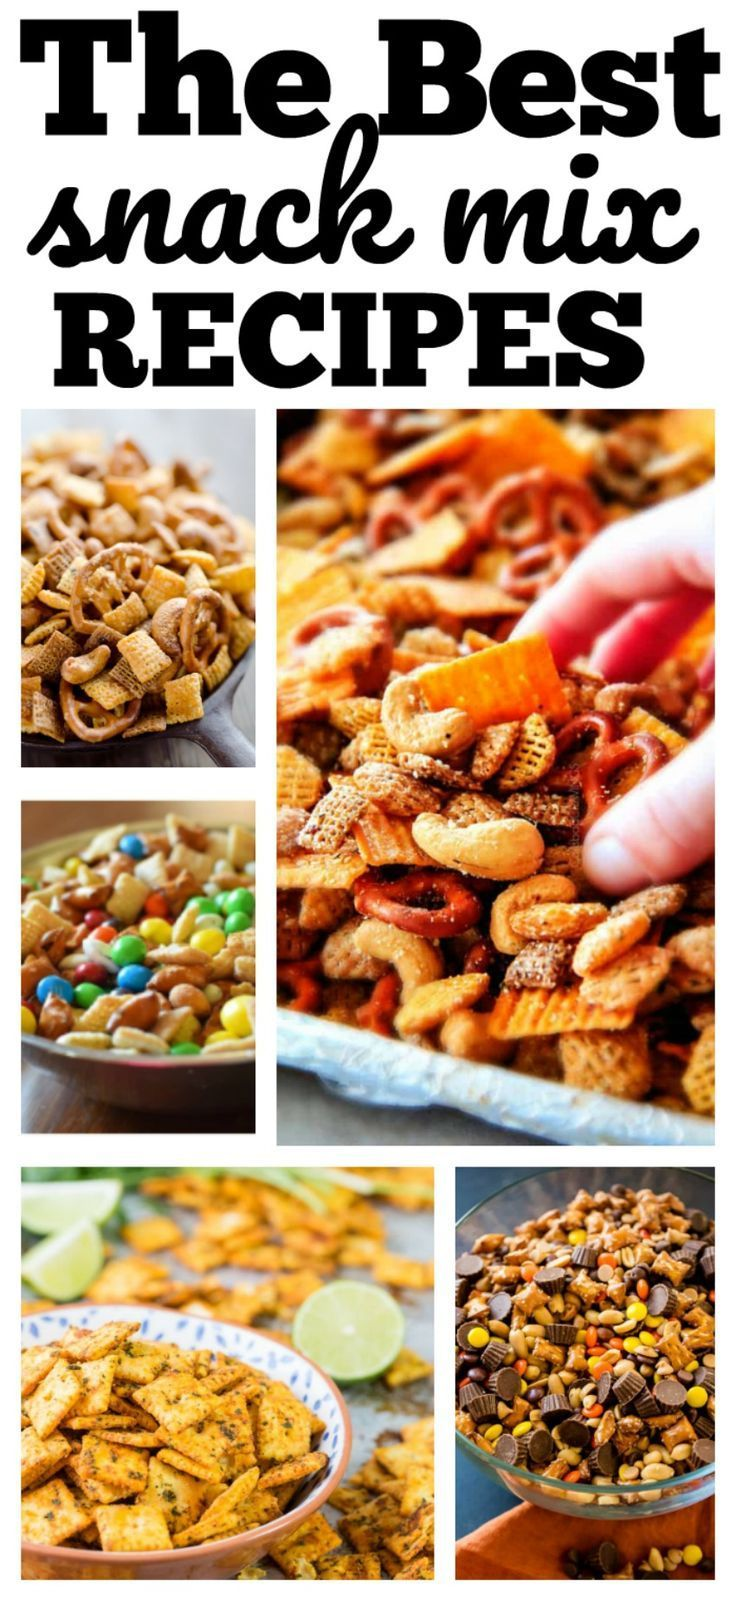 The Best Snack Mix Recipes   Snack Mixes   Snack mix recipes